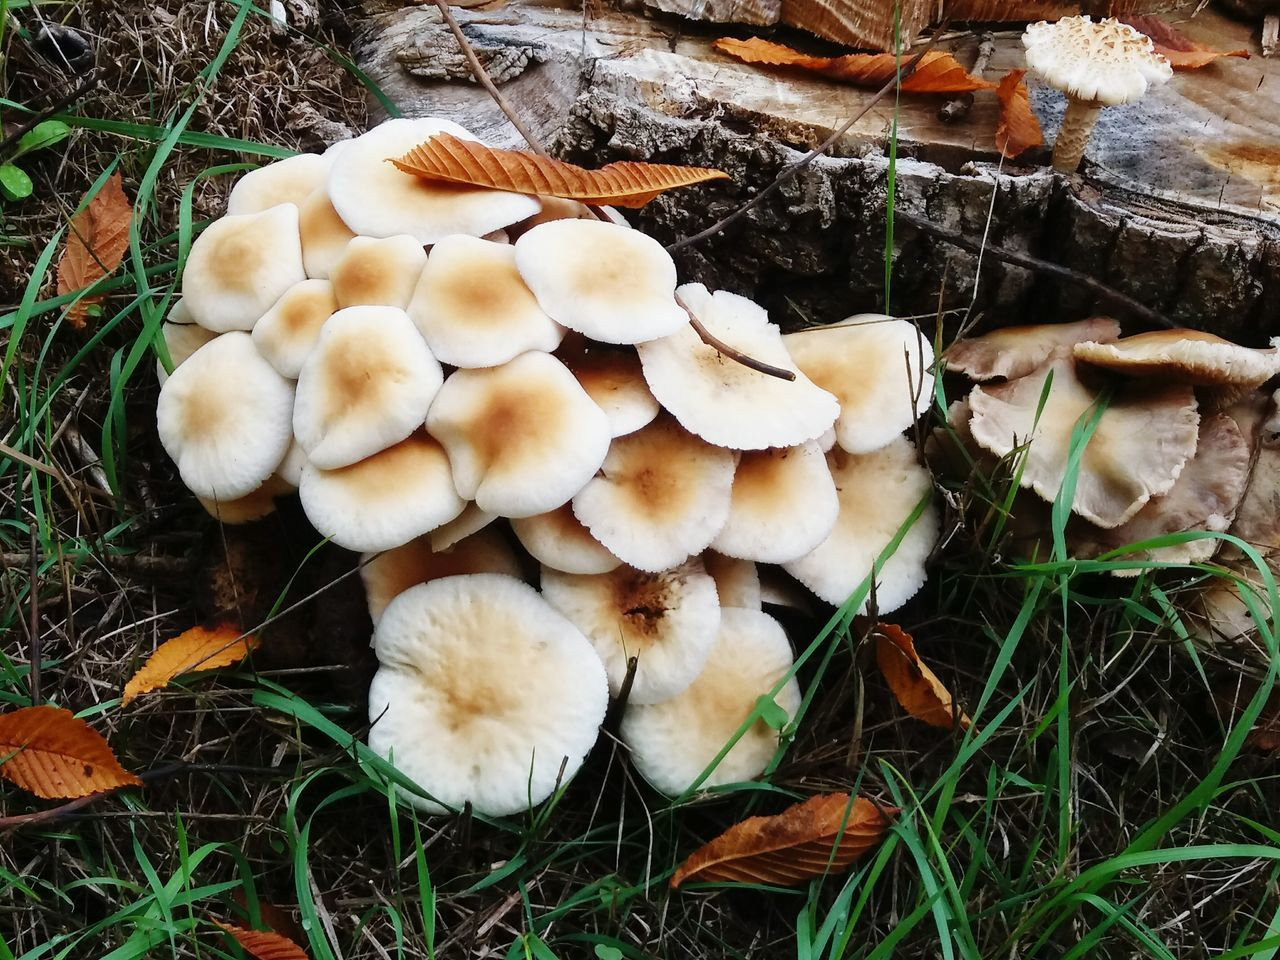 Mushroom Fungus Nature Outdoors Beauty In Nature Setas Segovialdia Segovia SPAIN Segoviafoto Mushroomphotography Mushroom Collection Mushroom Hunting Mushrooms On A Tree